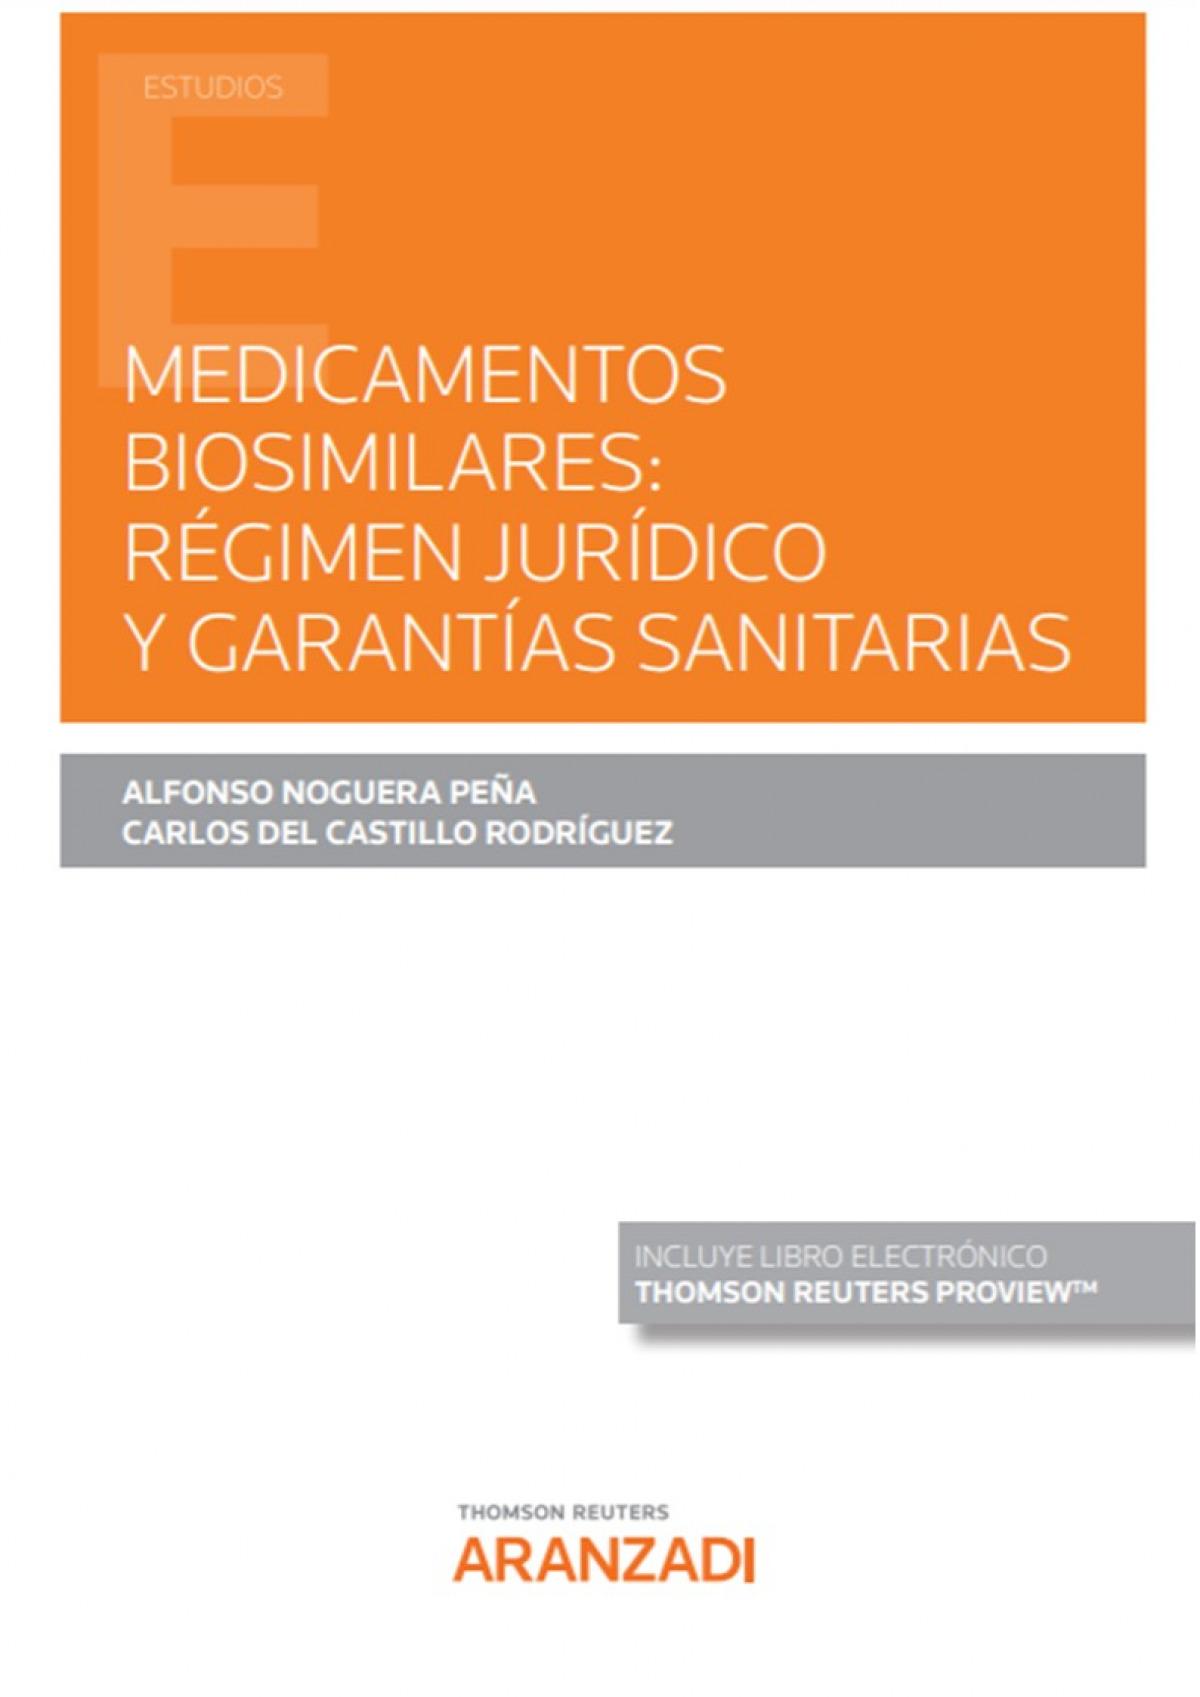 Medicamentos biosimilares: régimen jurídico y garantías sanitarias (Papel + e-book)